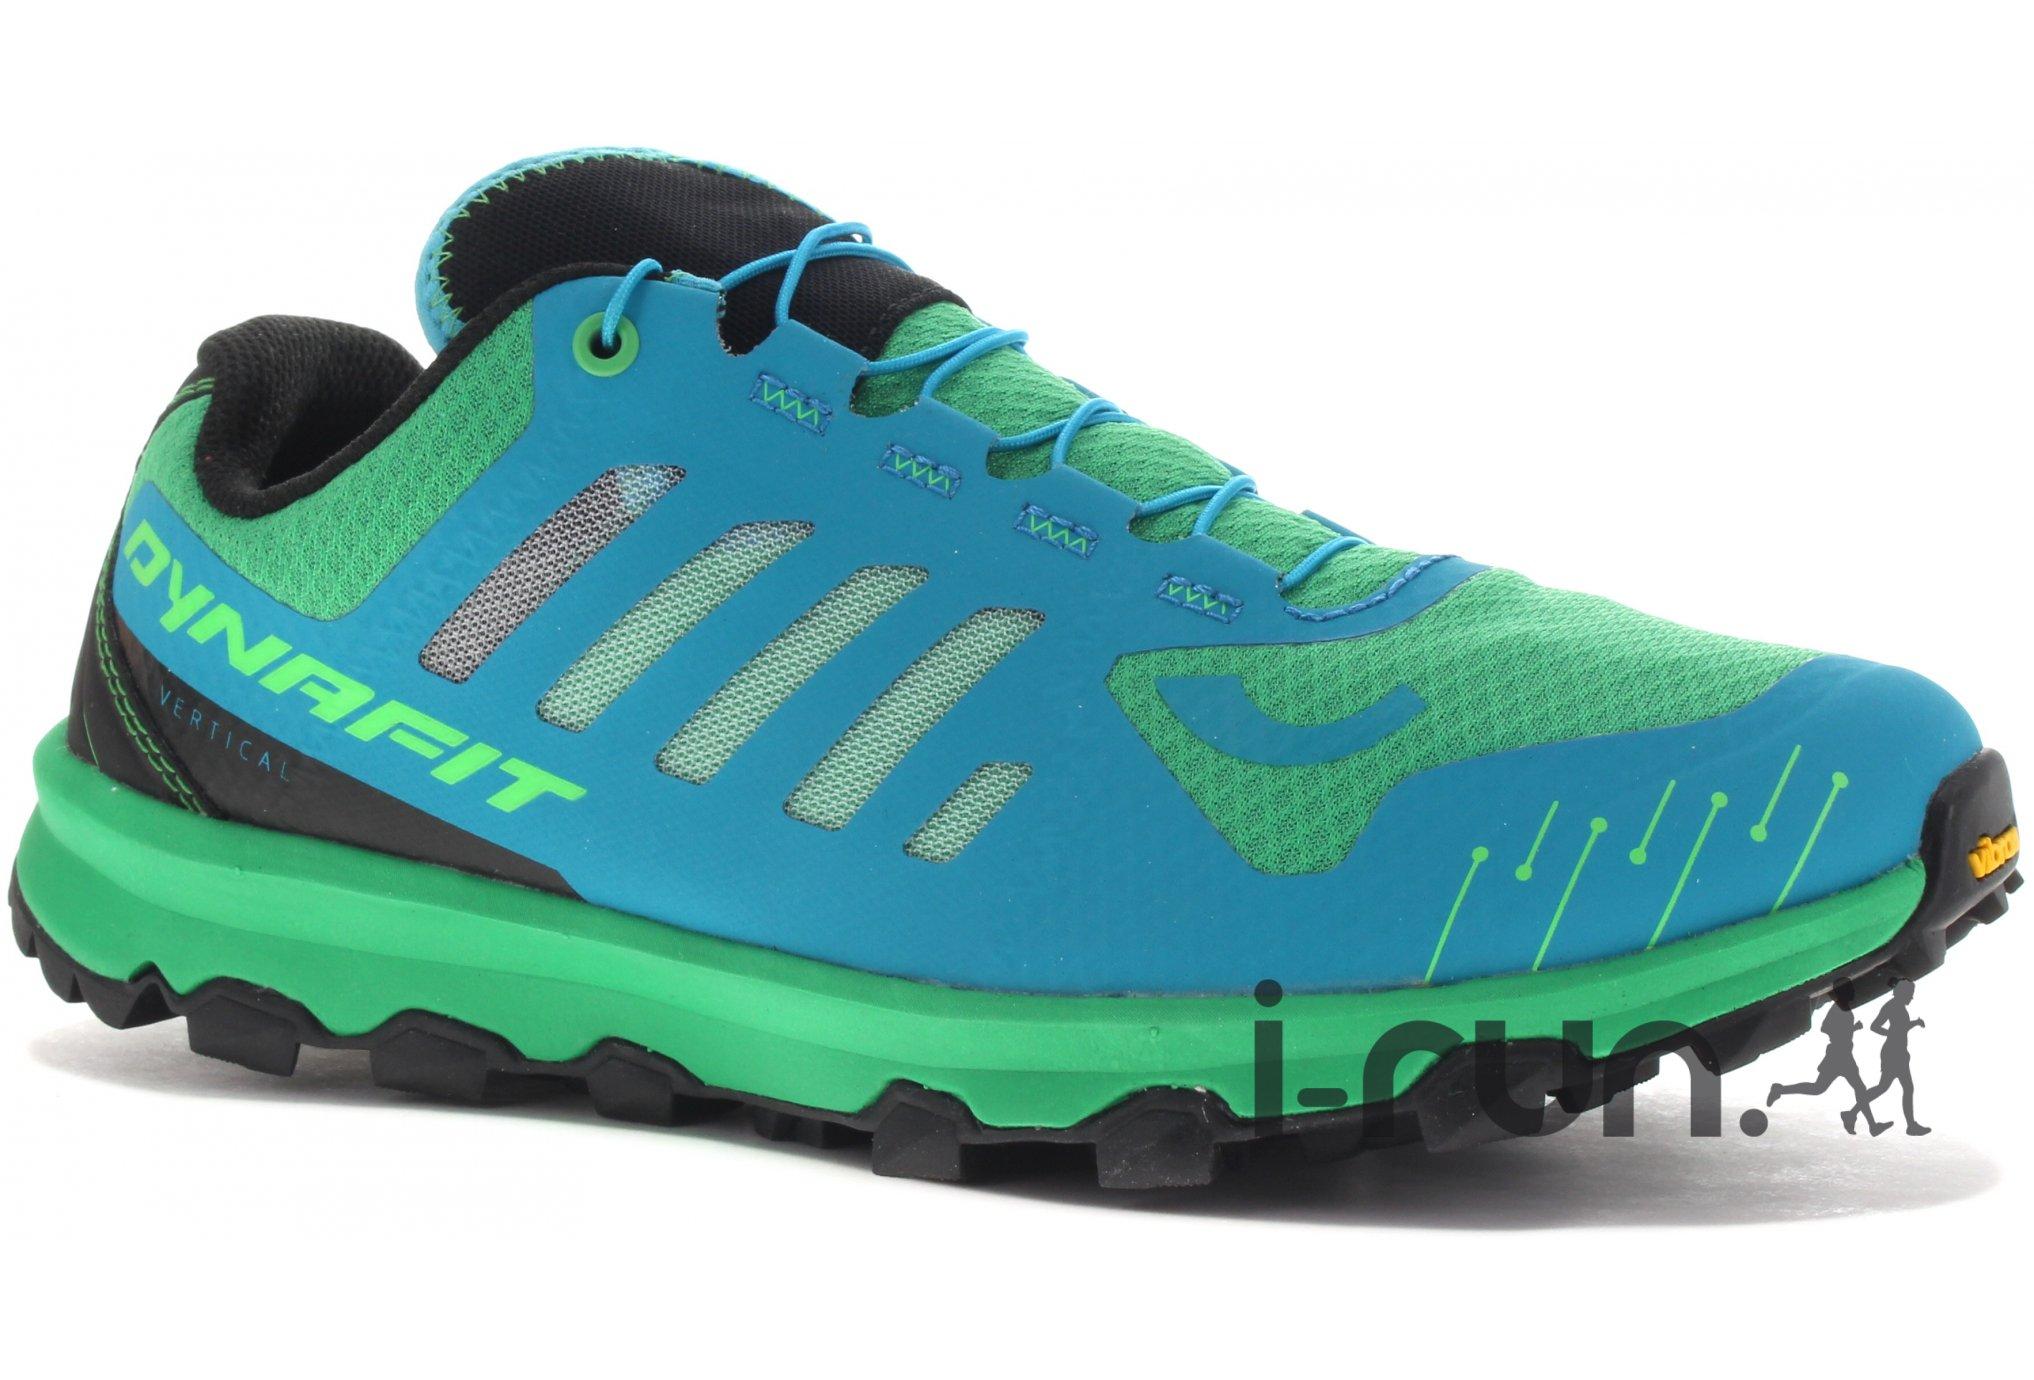 Dynafit Feline vertical w chaussures running femme